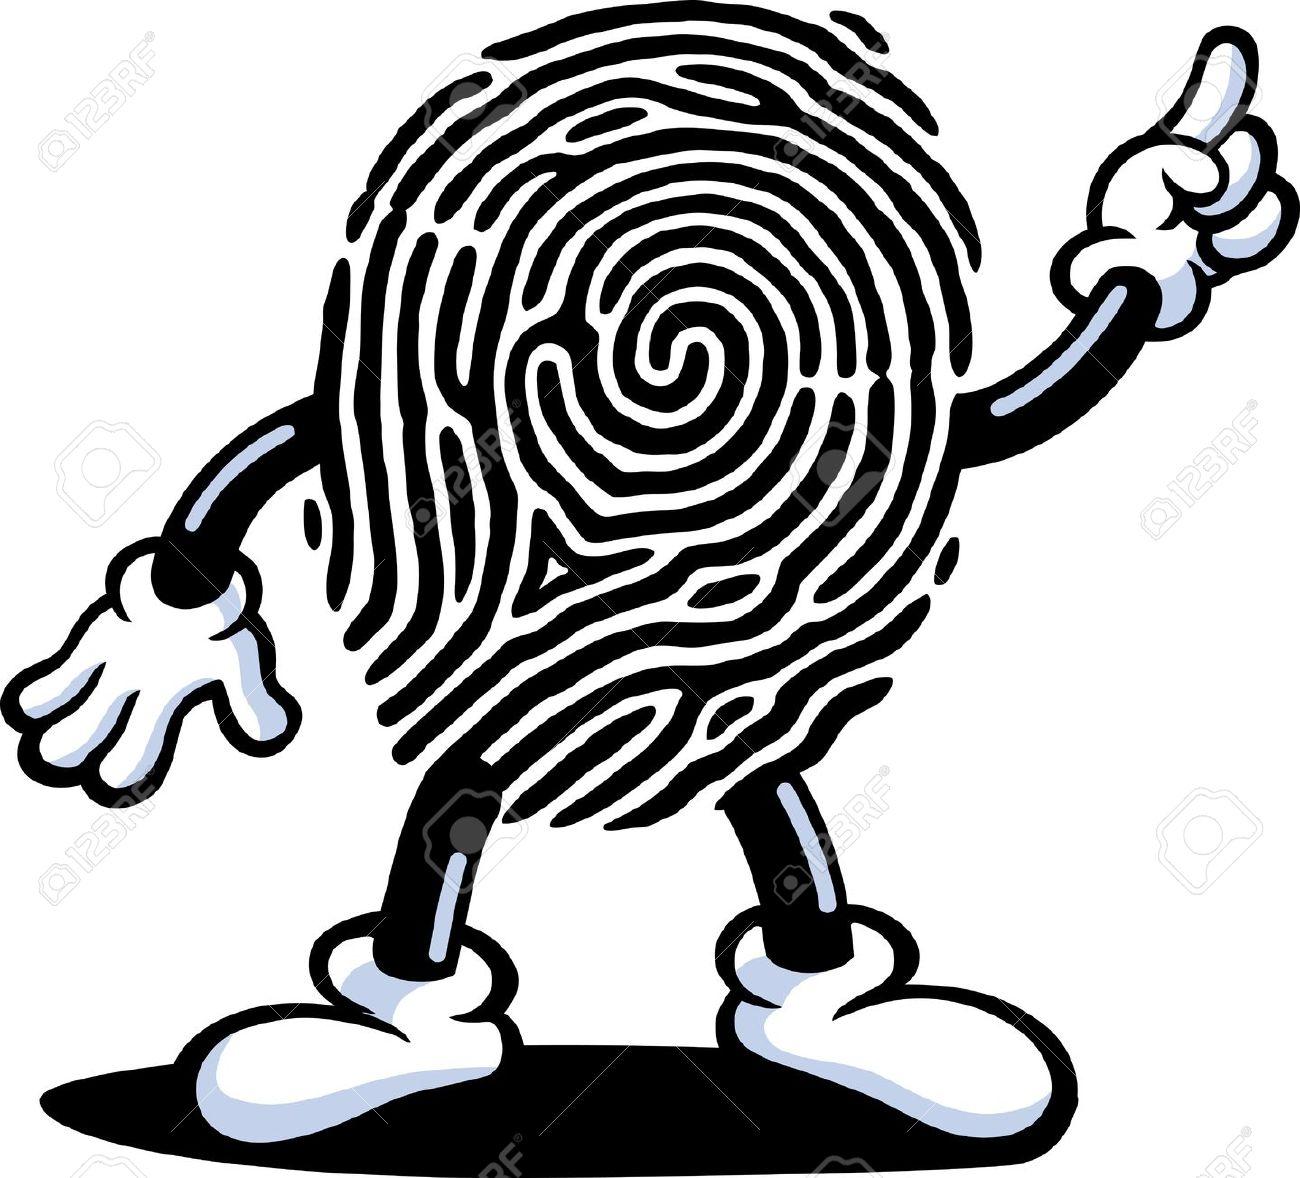 Aktivasi & Update Aplikasi Fingerprint